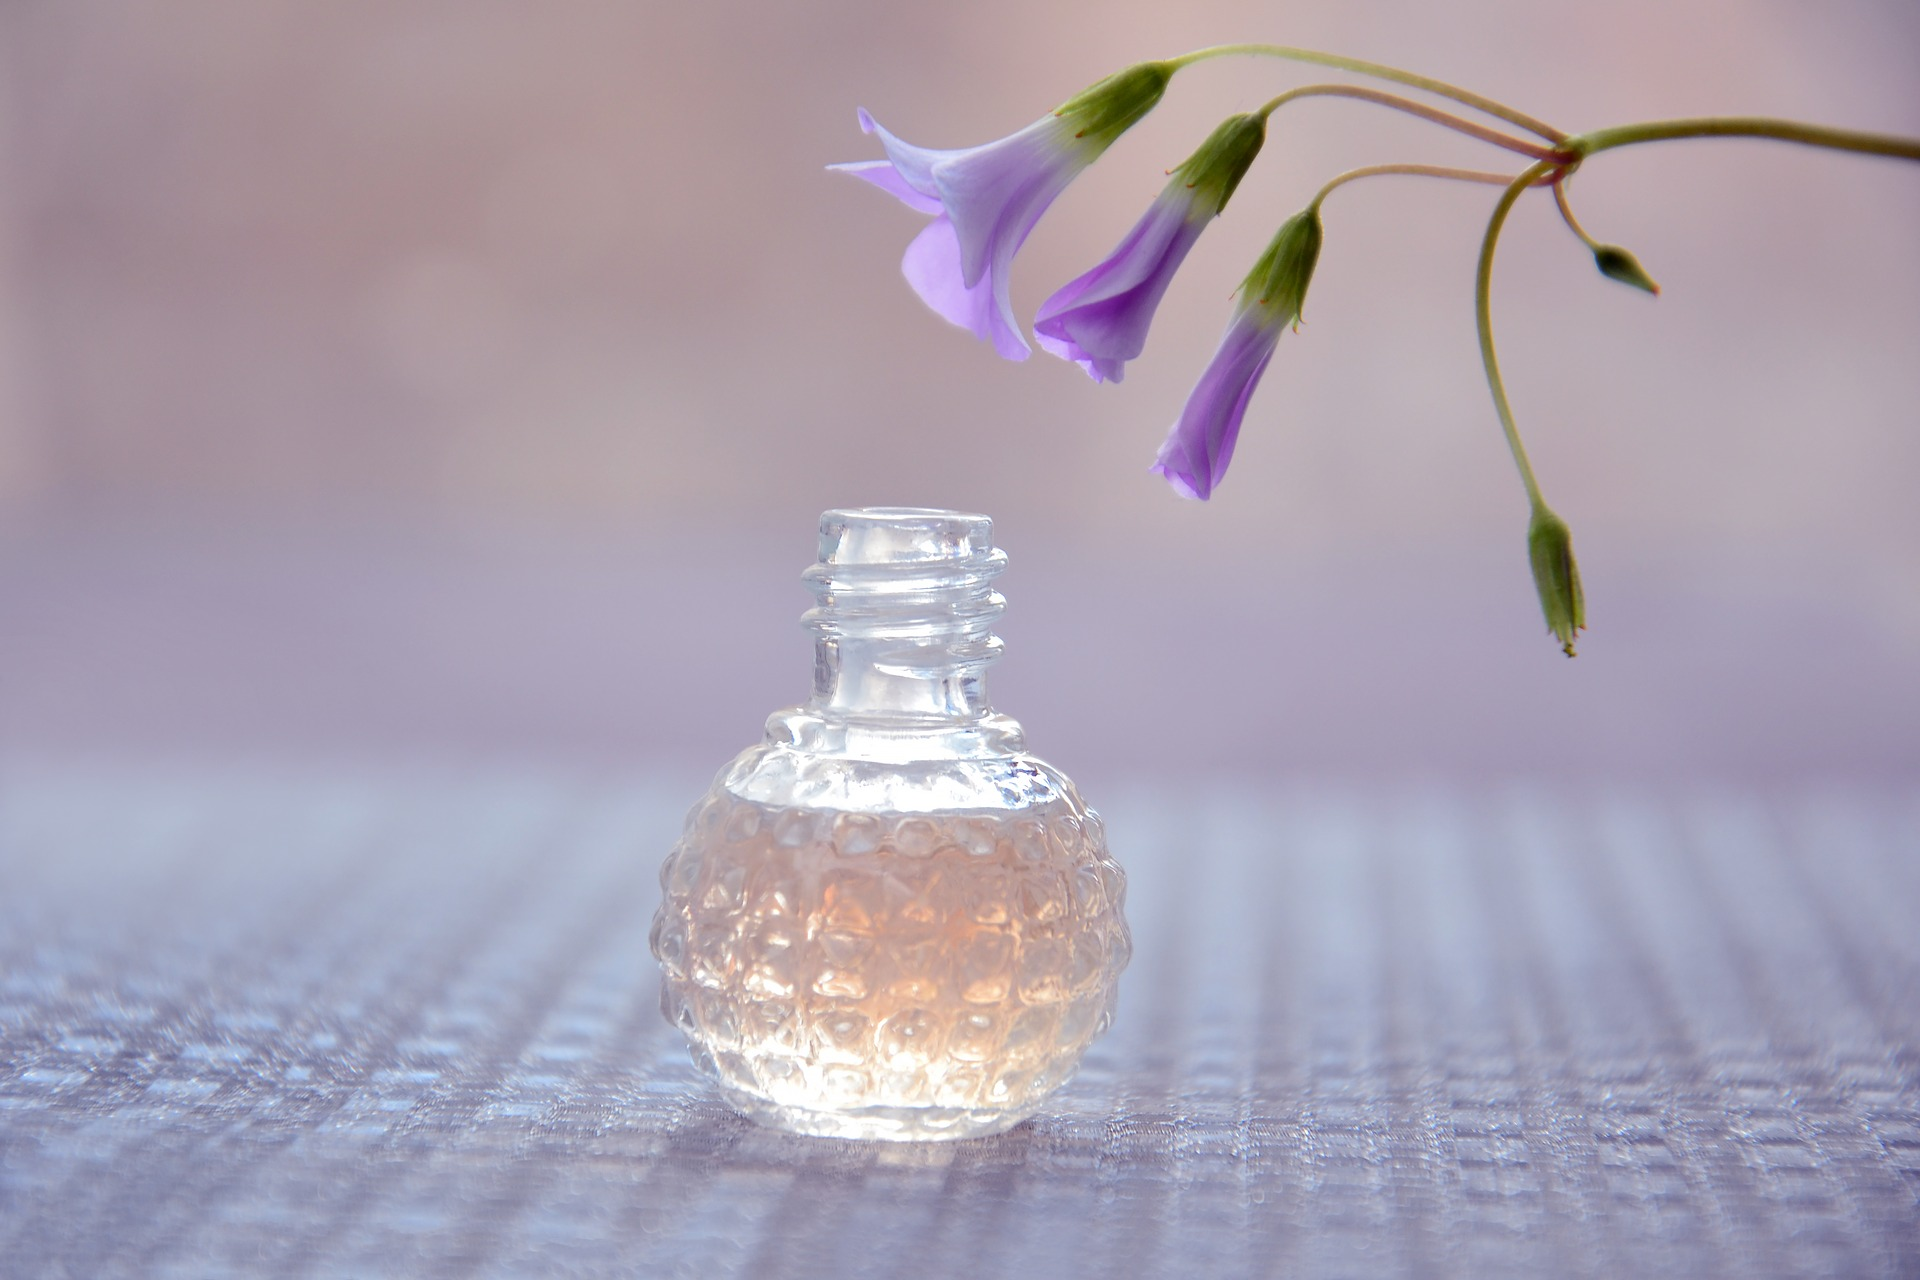 Voňavá terapie, aneb vyzkoušejte aromaterapii